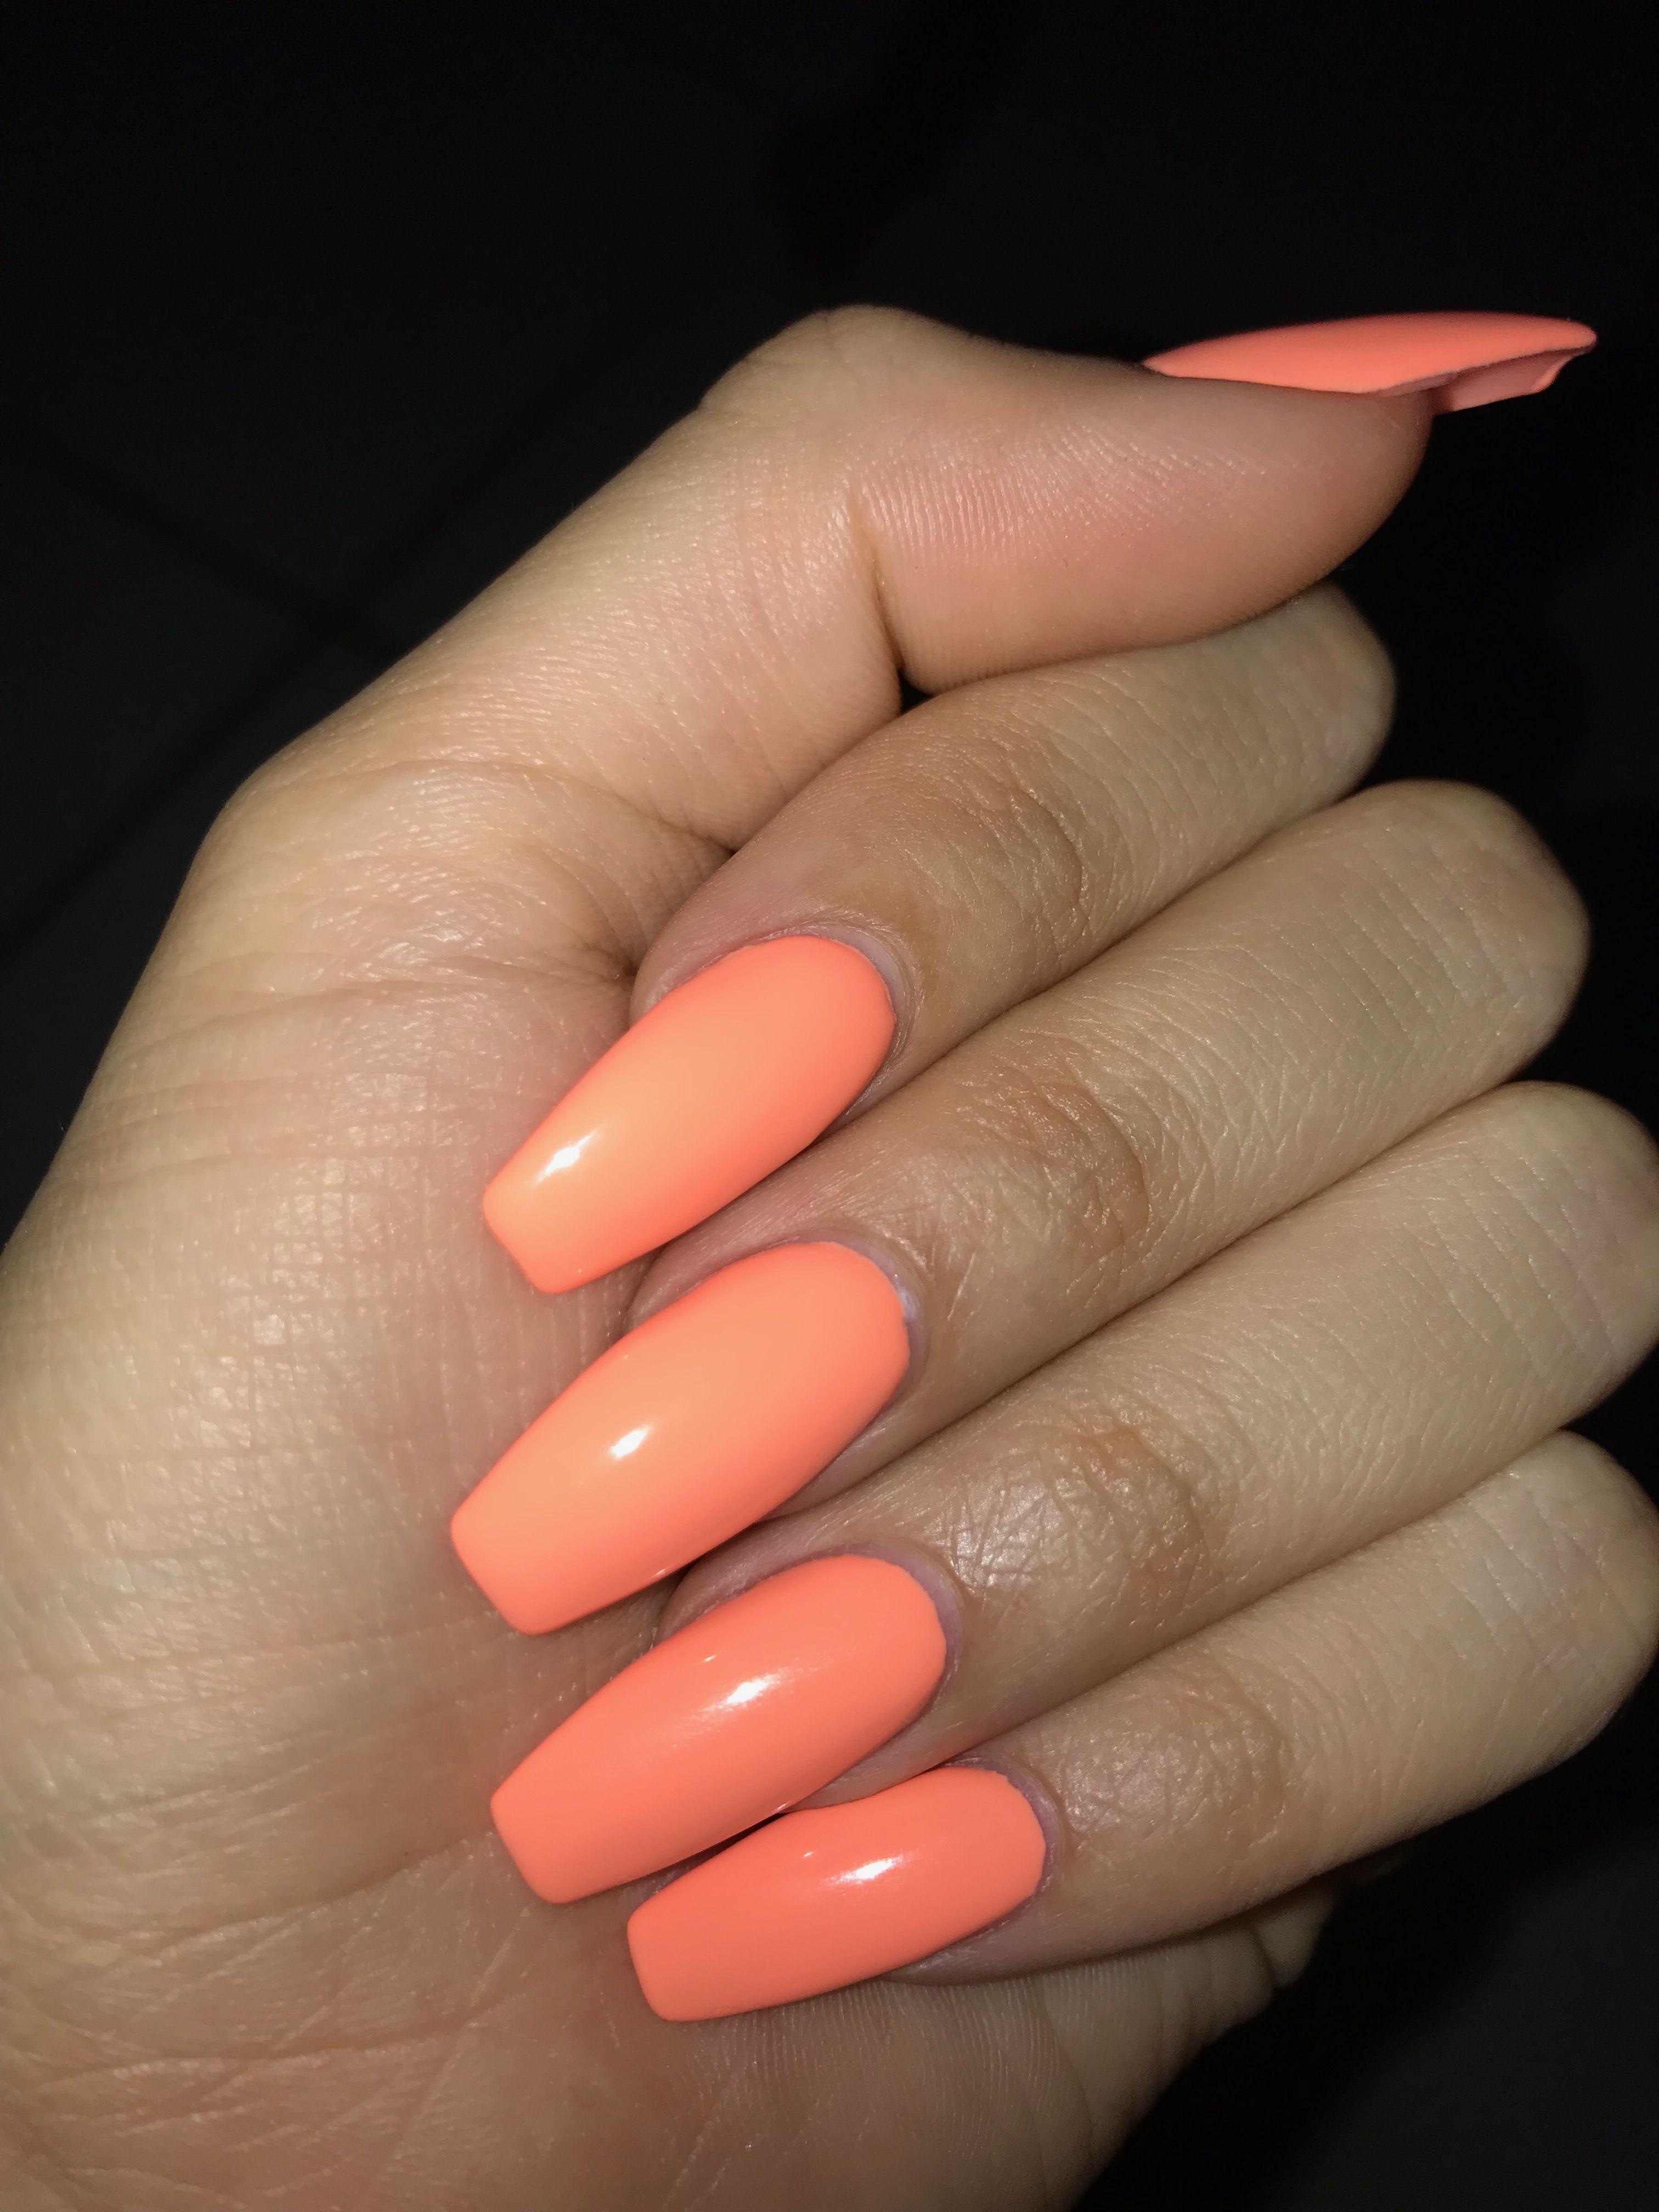 peach nails. #peach #nails #acrylic